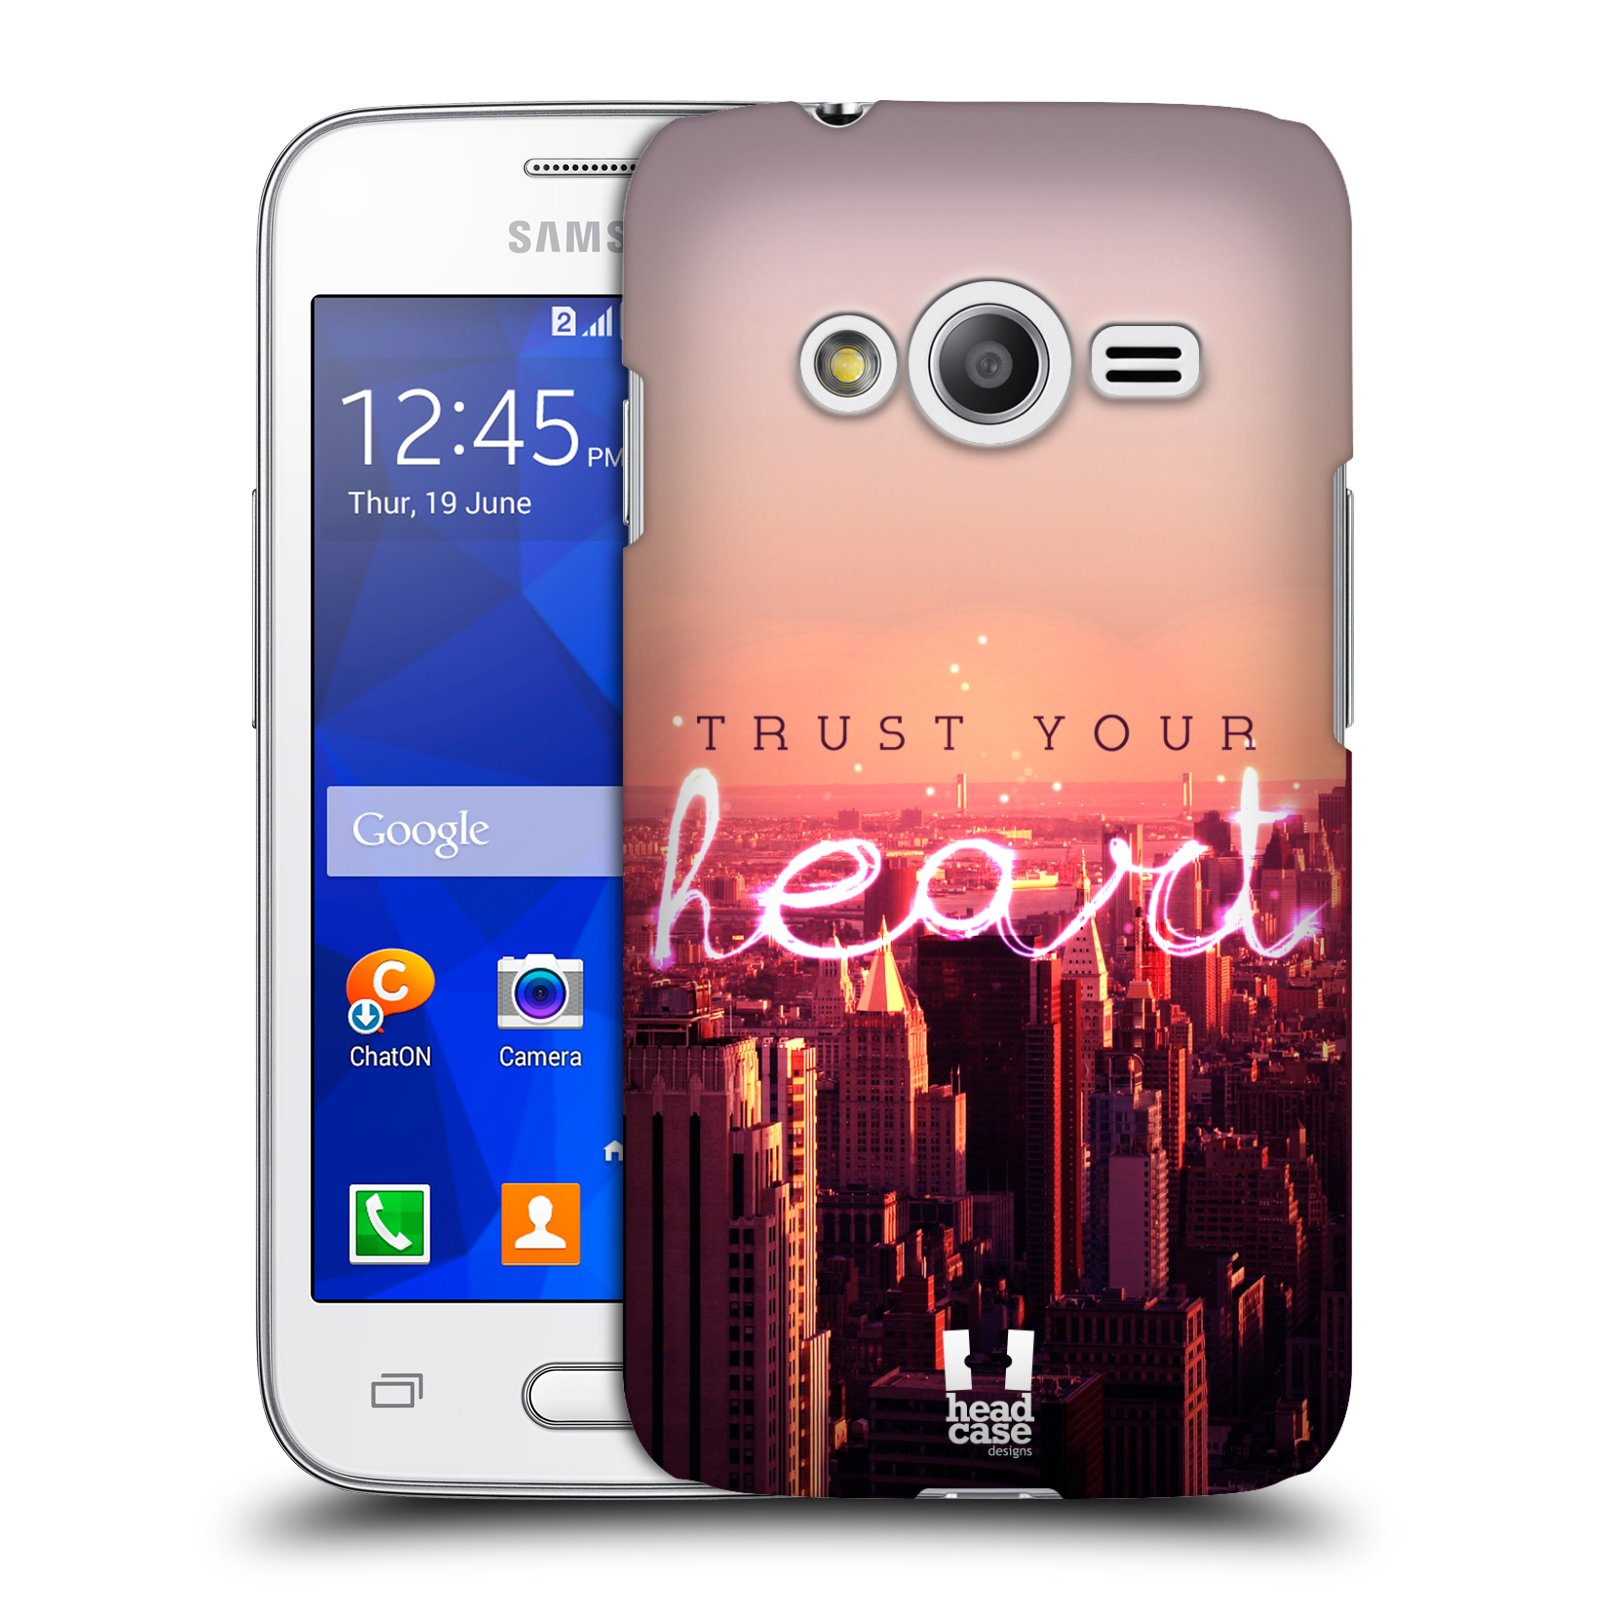 Plastové pouzdro na mobil Samsung Galaxy Trend 2 Lite HEAD CASE TRUST YOUR HEART (Kryt či obal na mobilní telefon Samsung Galaxy Trend 2 Lite SM-G318)